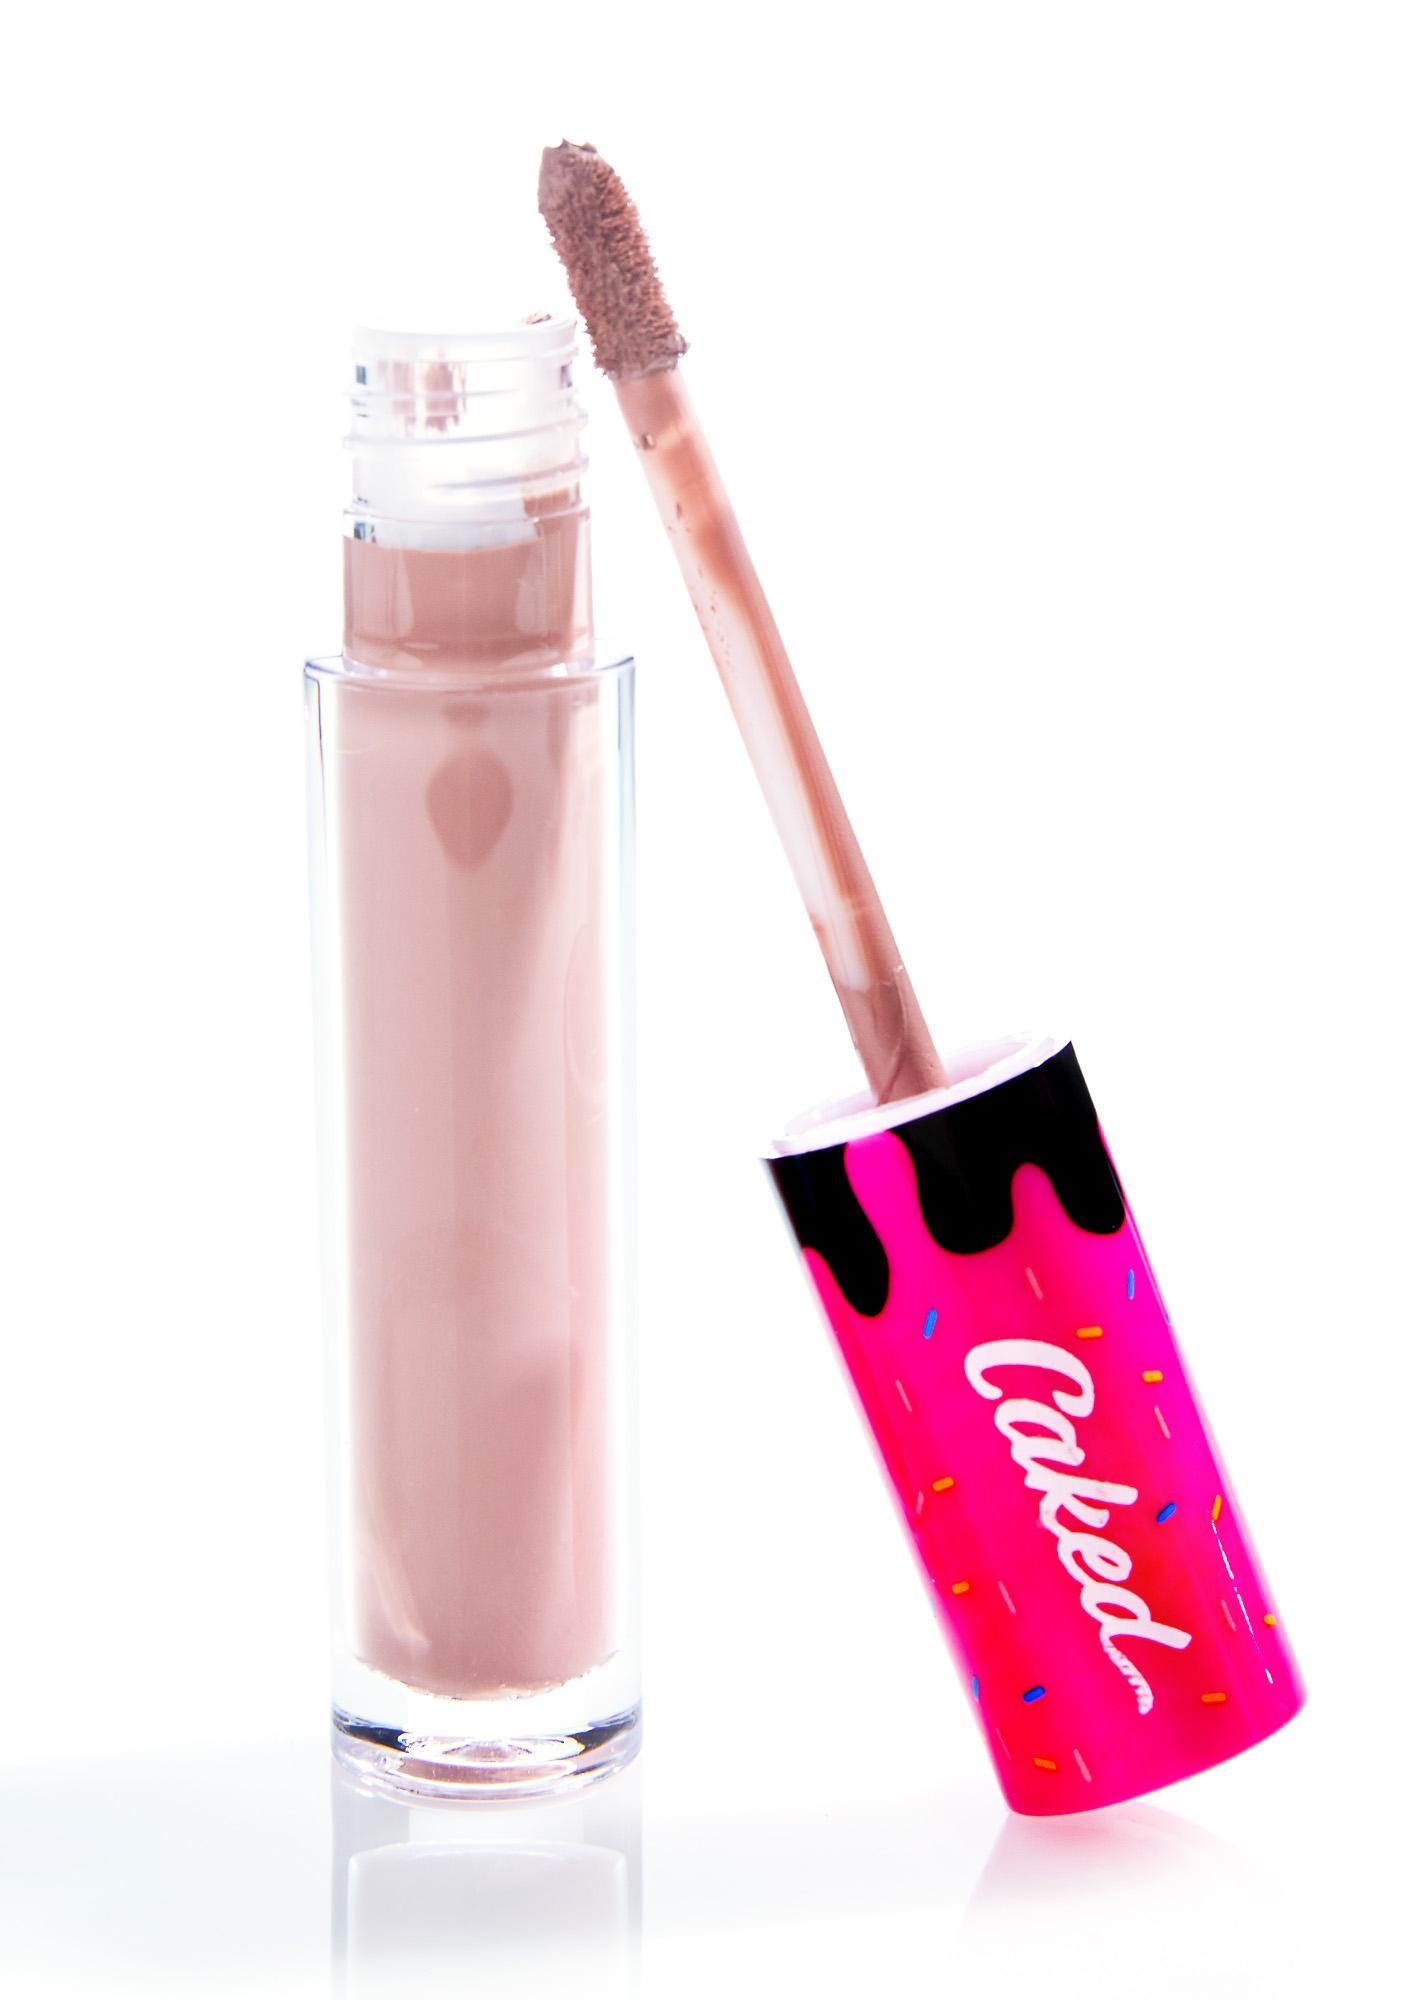 Caked Makeup Copy Paste Lip Fondant